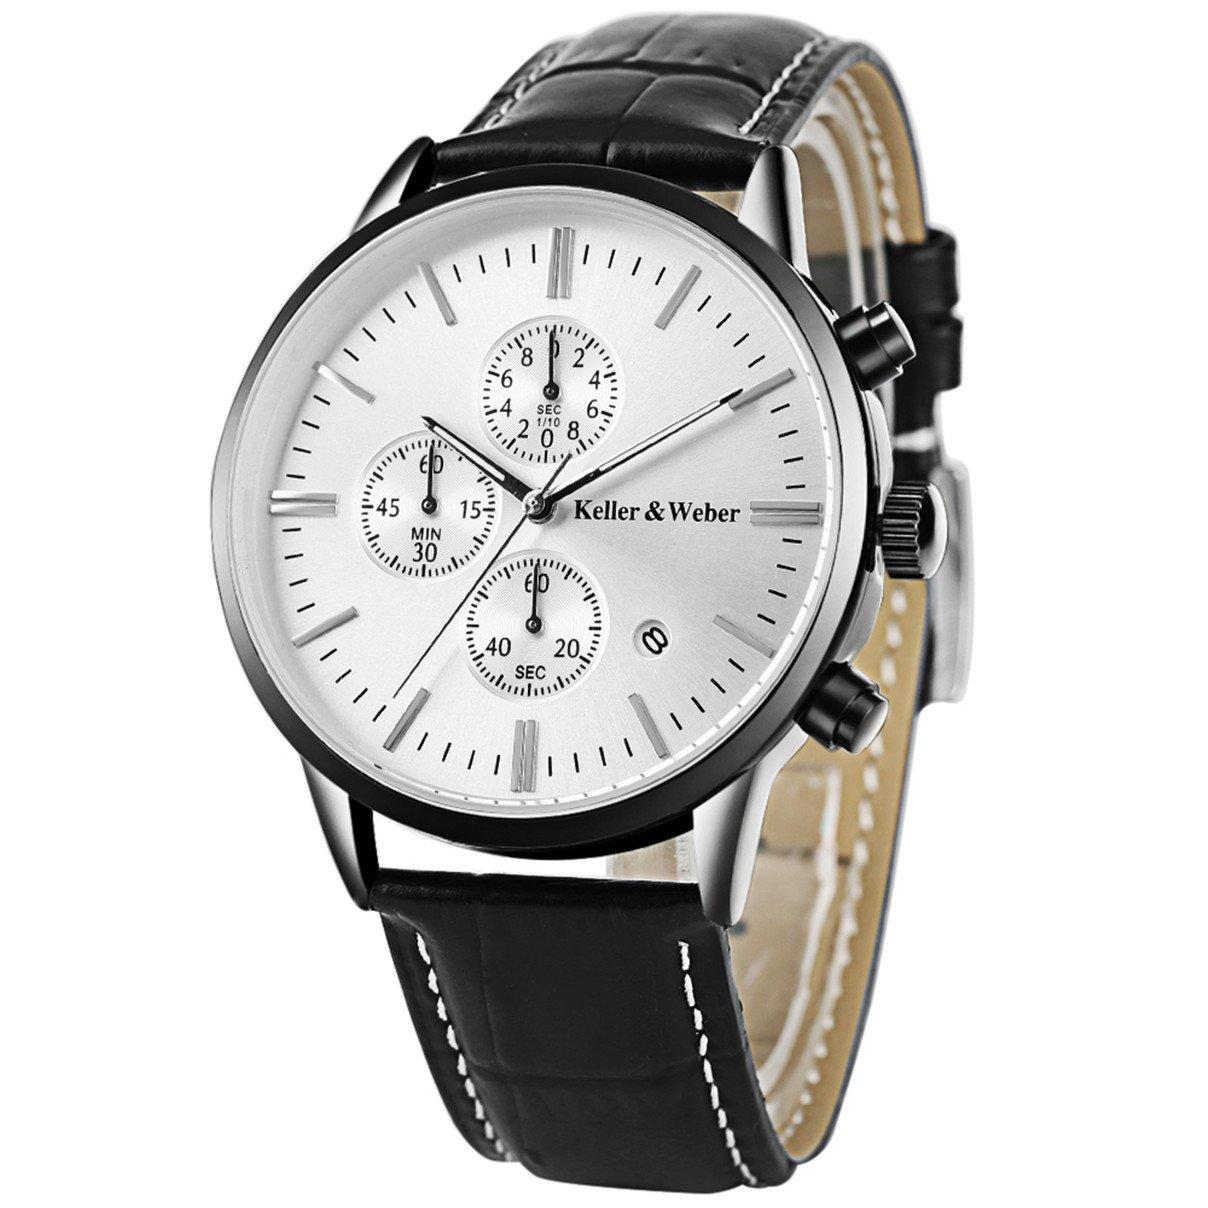 Mens Watches Leather Strap Quartz Analog Chronograph Calendar Date Waterproof Wristwatch by Keller&Weber